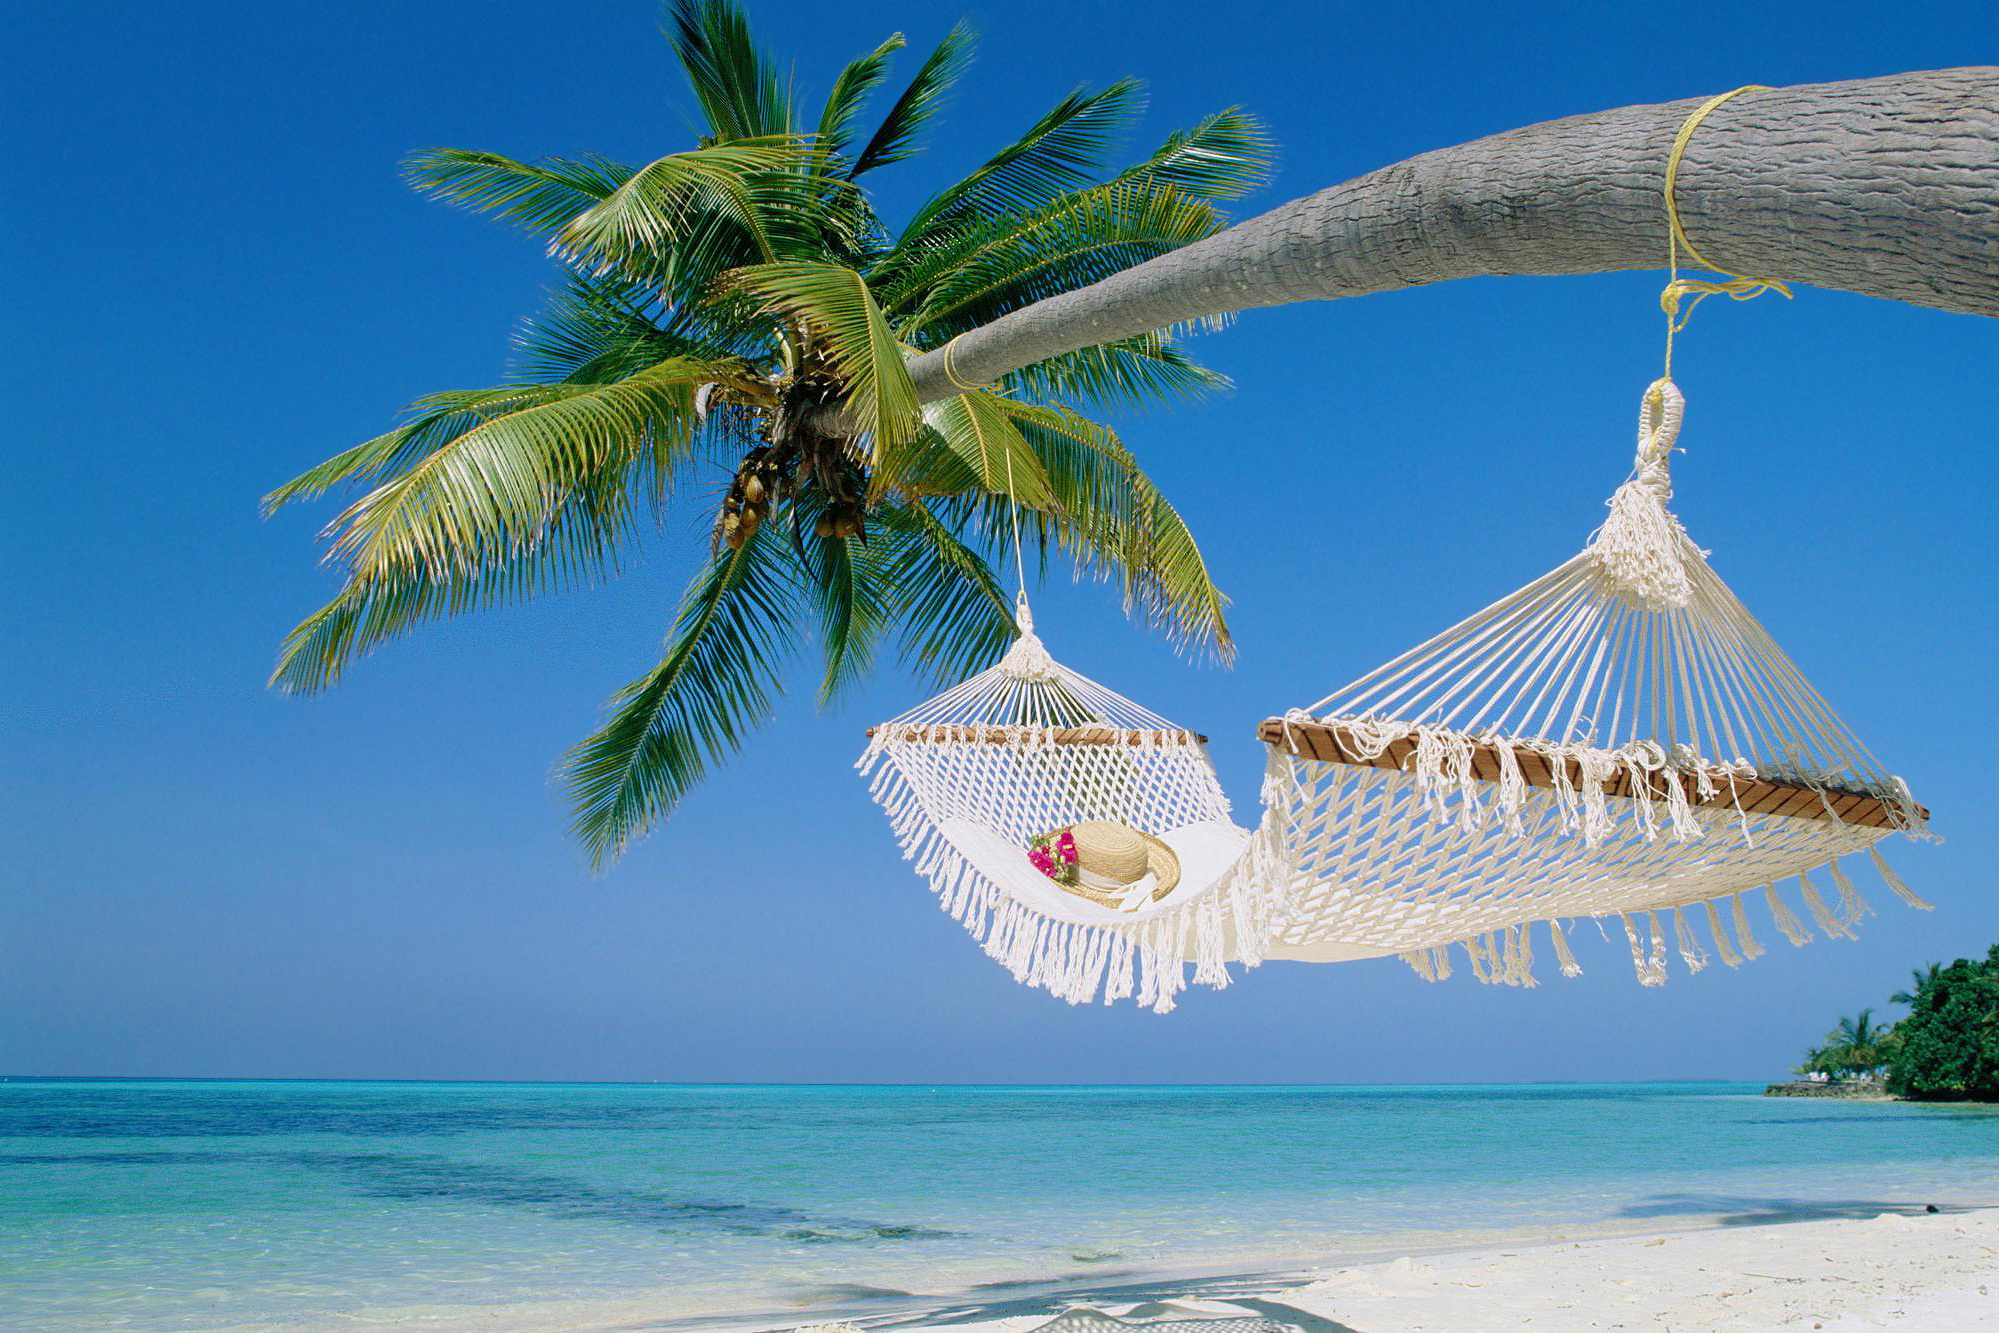 Tropical Island Beach Hammock - wallpaper